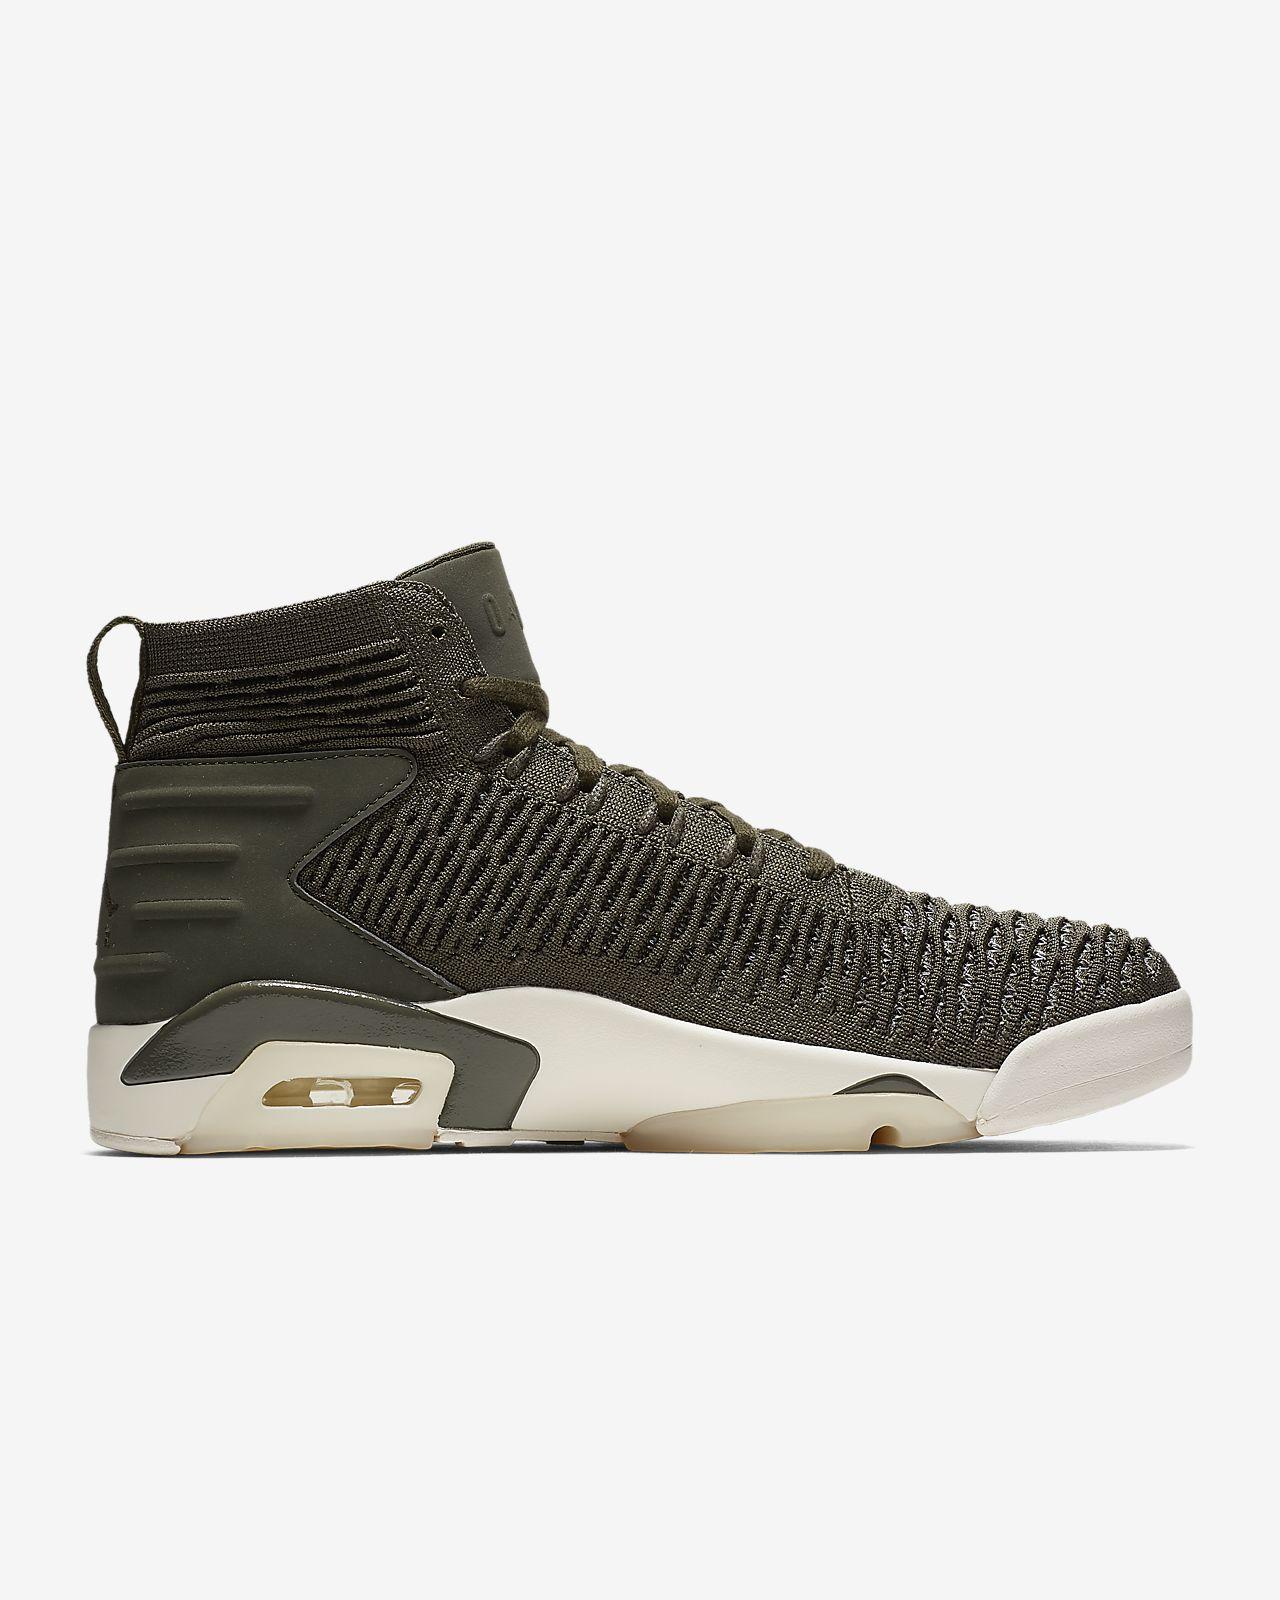 007e4f456137 Jordan Flyknit Elevation 23 Men s Shoe. Nike.com